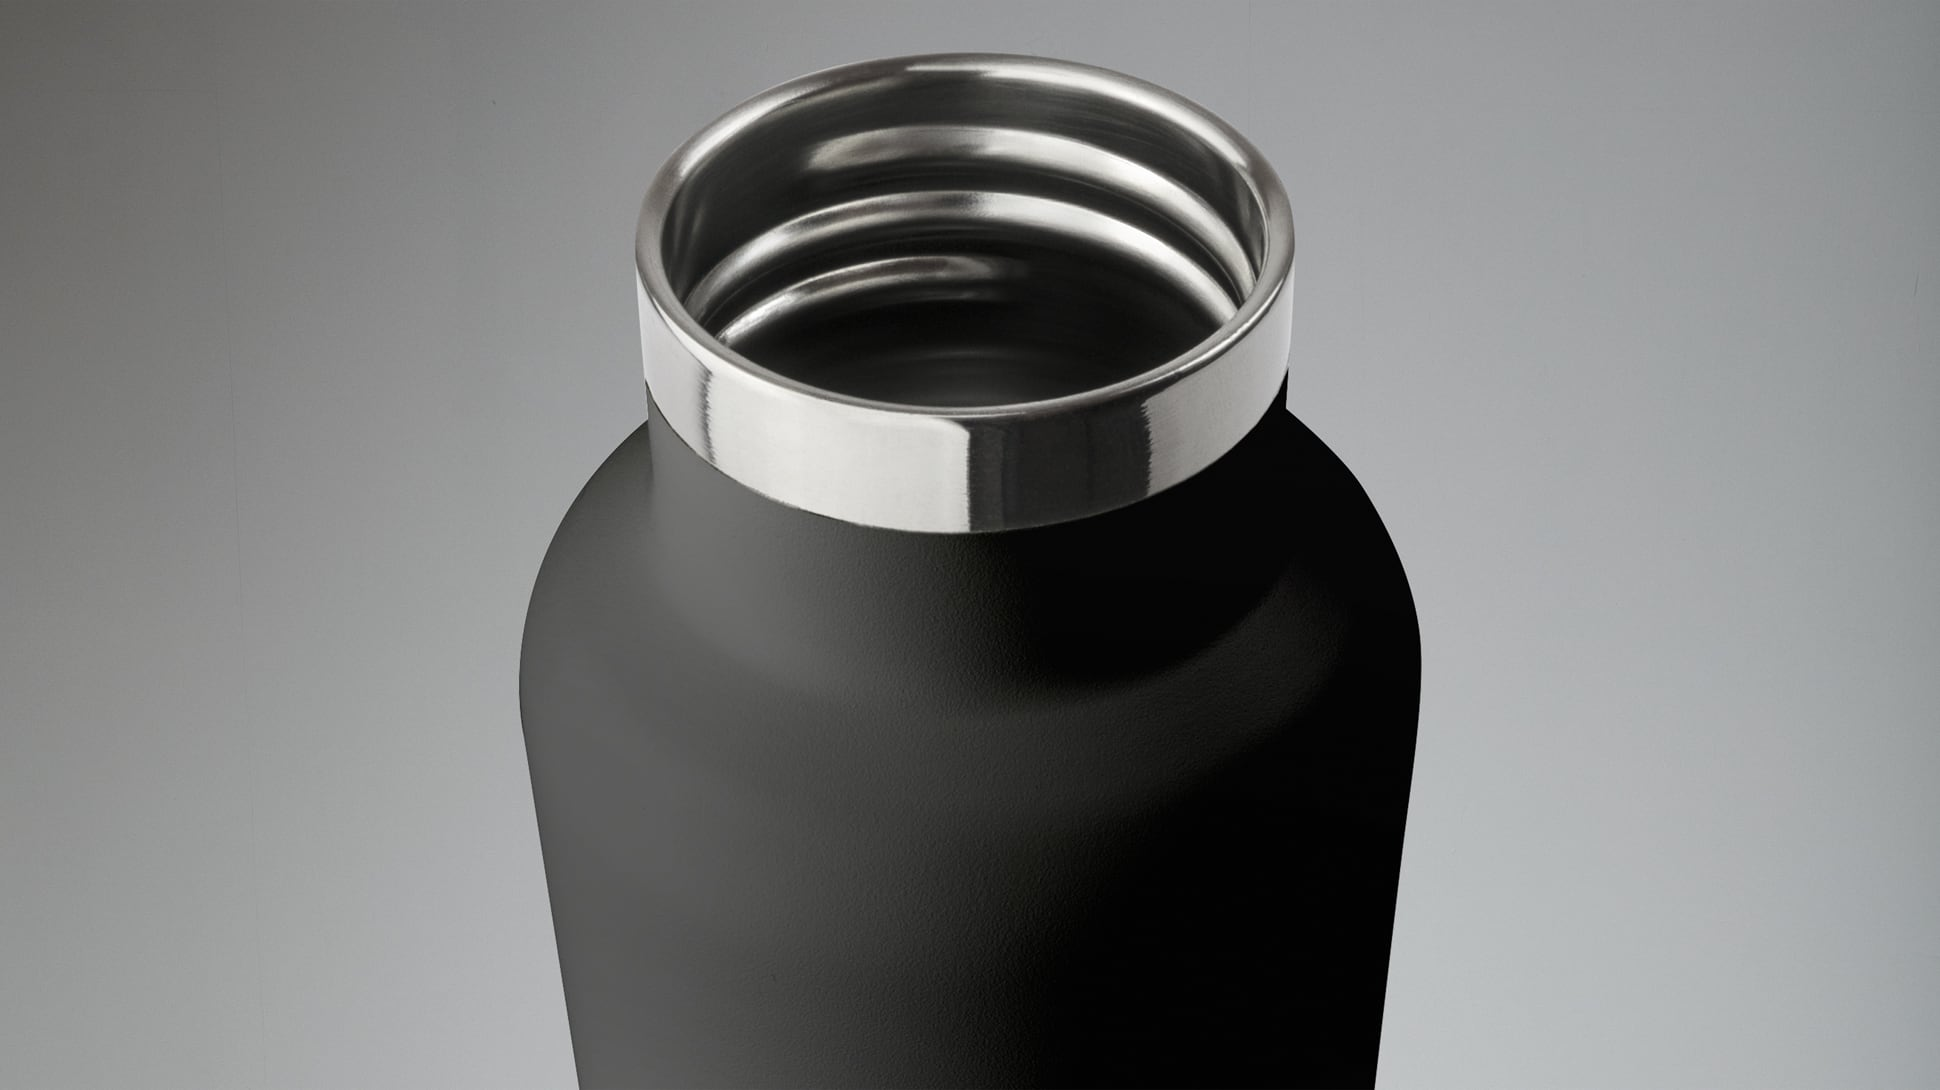 26 oz. PXG Water Bottle Image 3